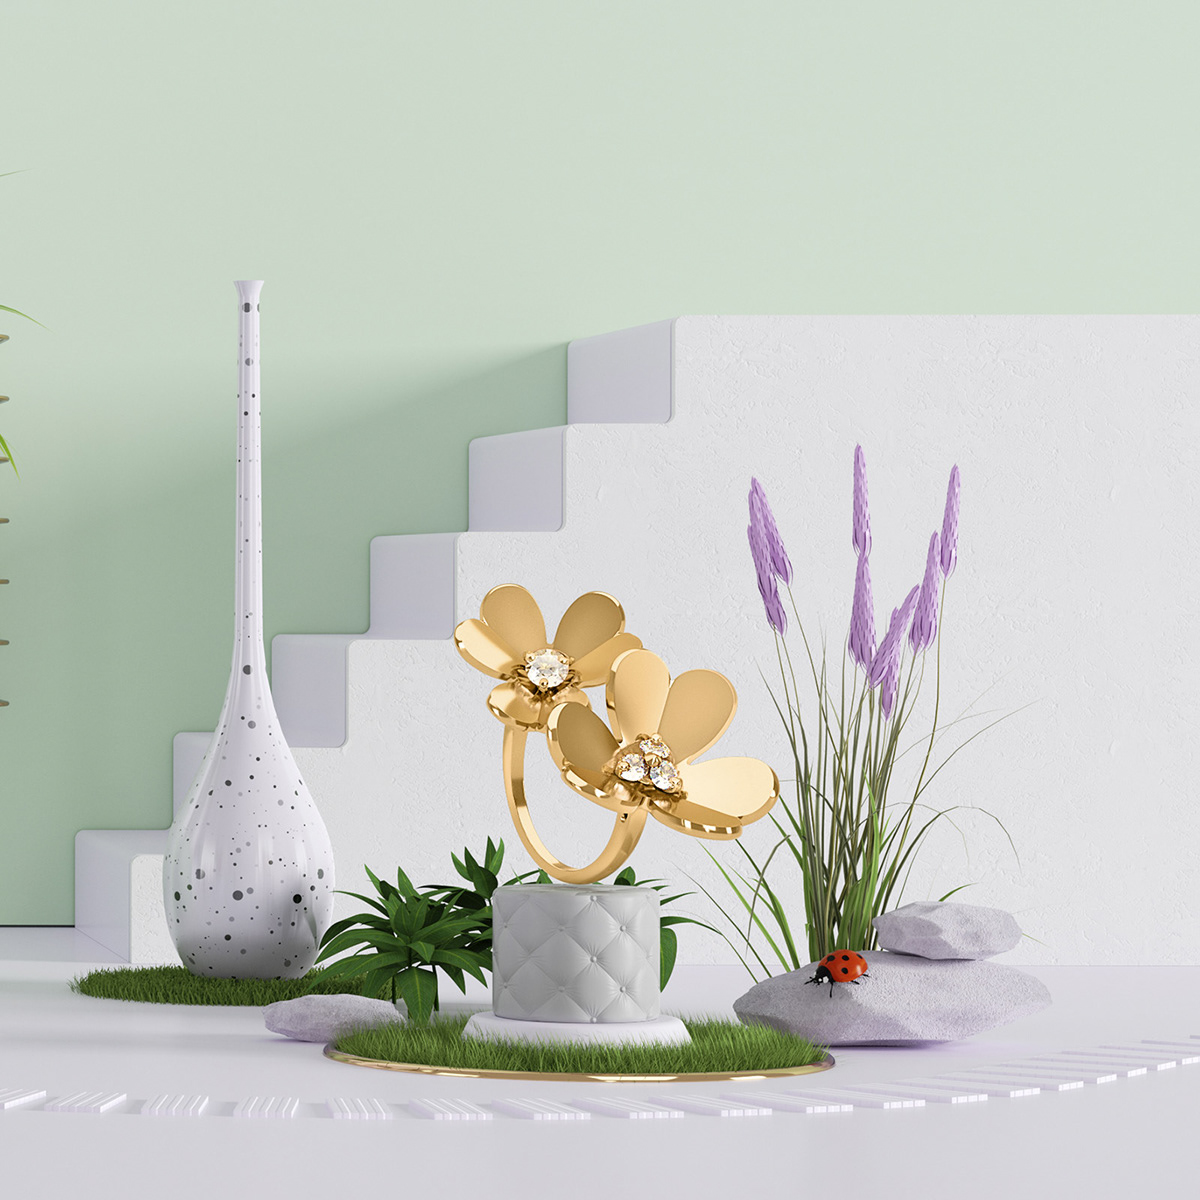 vancleef&arpels jewel art 3D ArtDirection cinema4d c4d Interior color set design